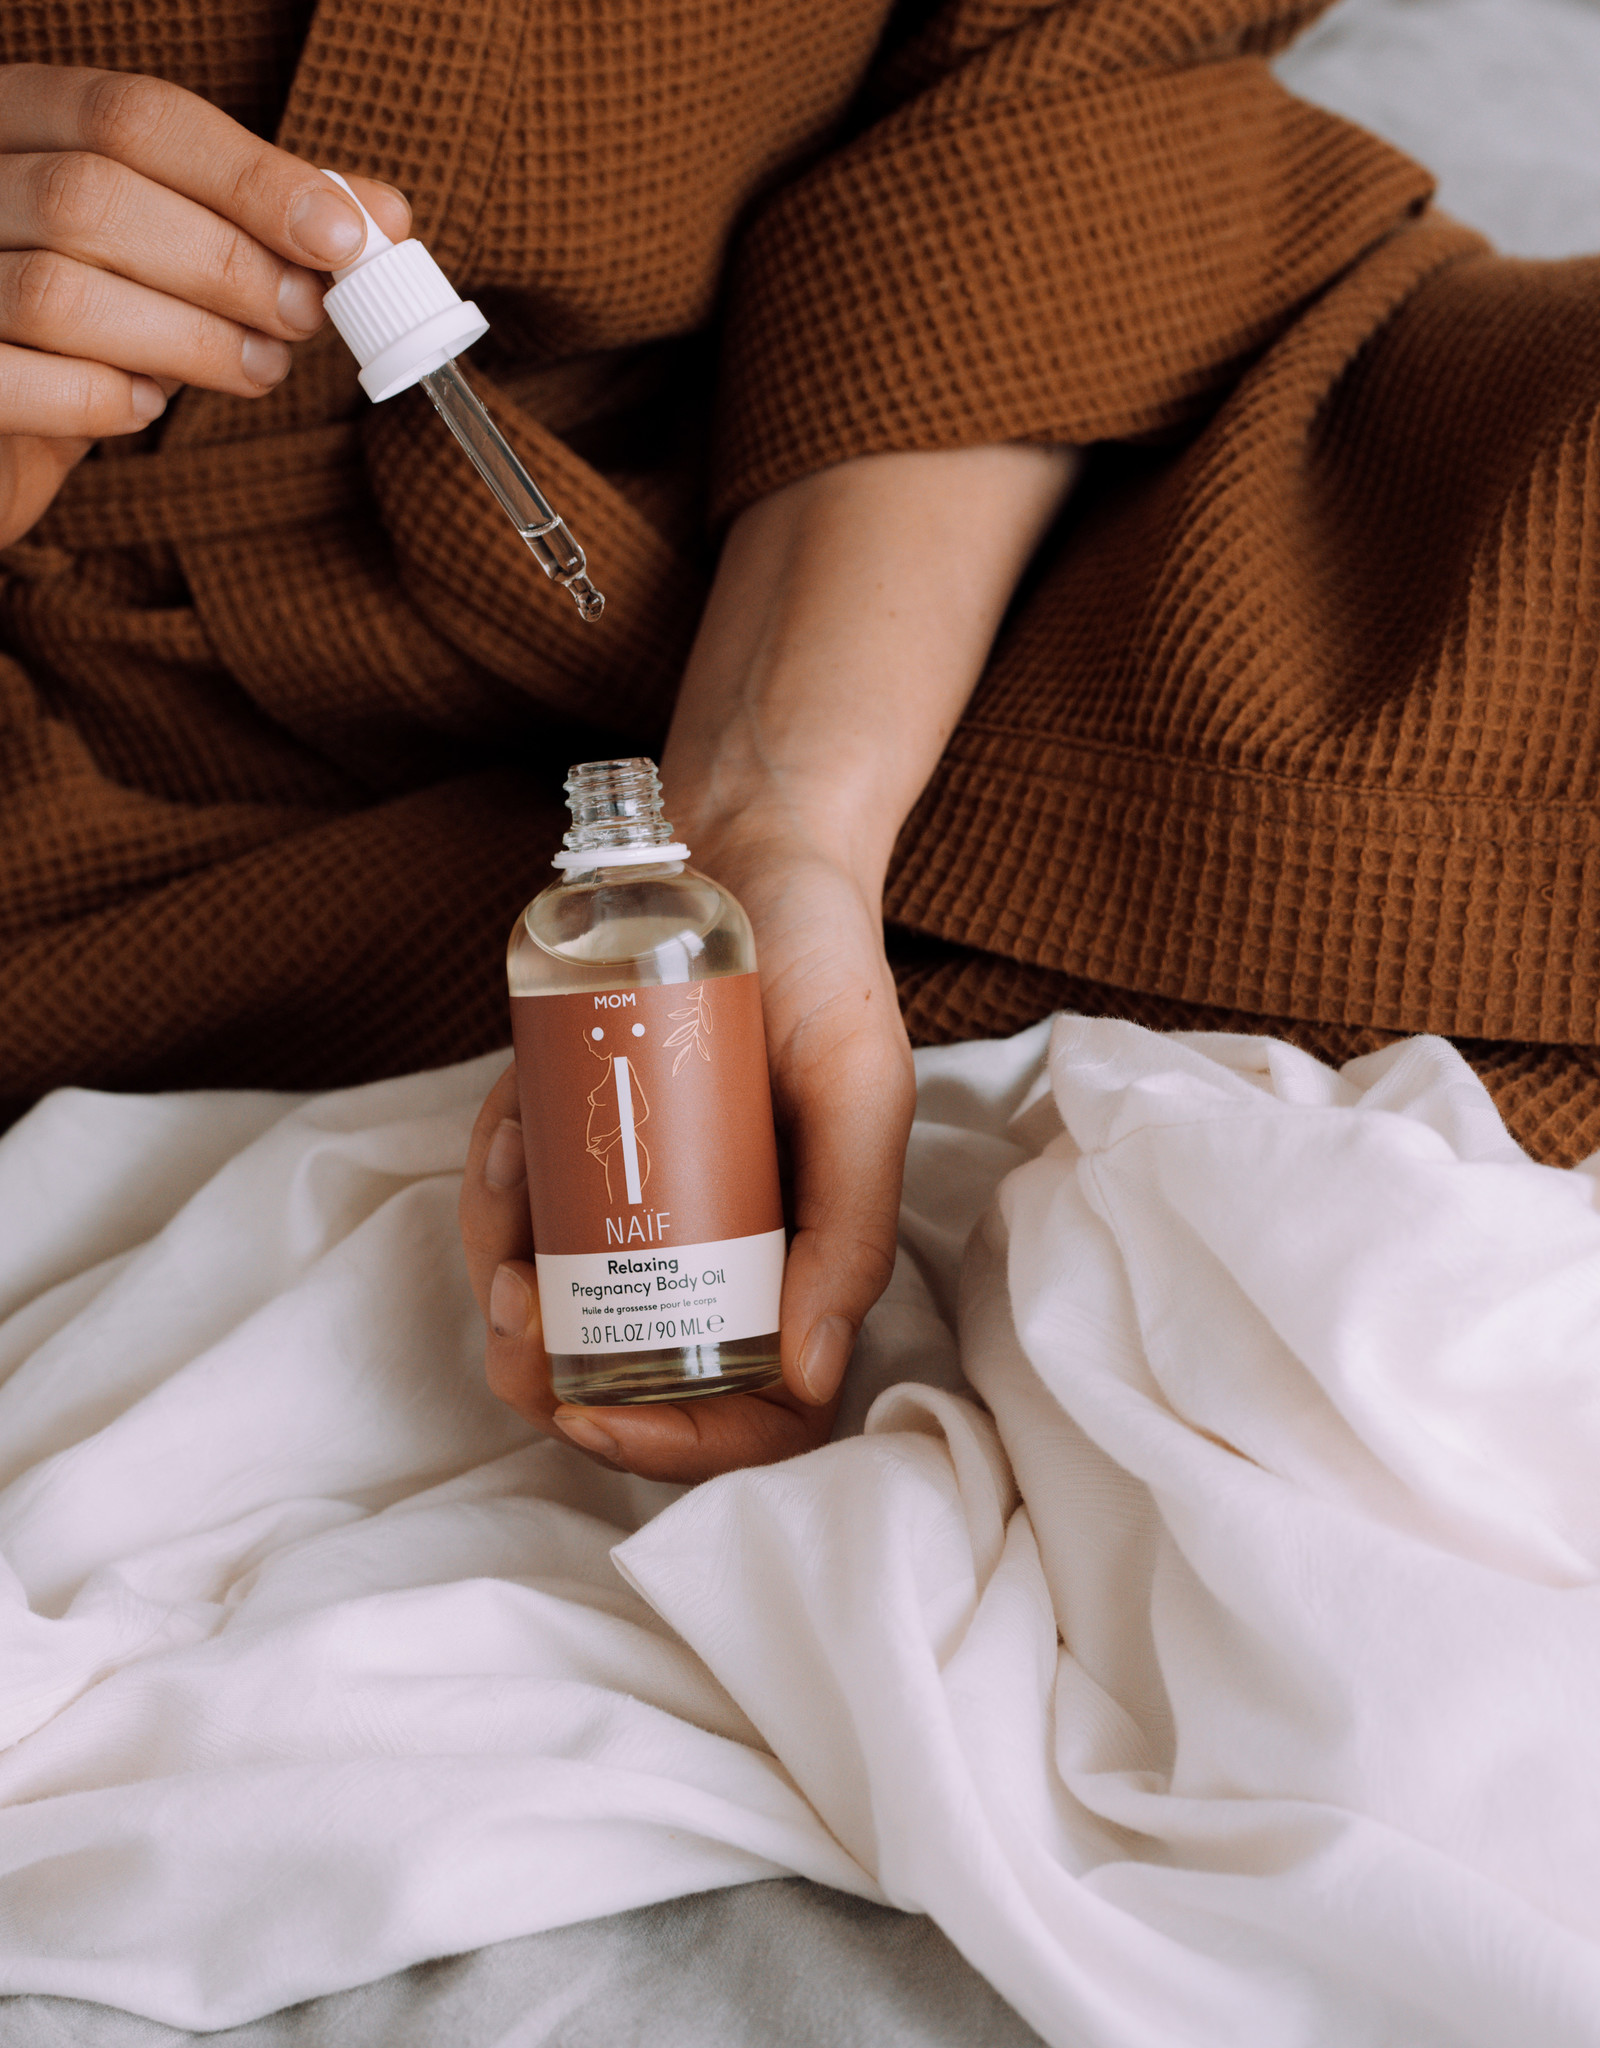 Naïf Mom Pregnancy Body Oil